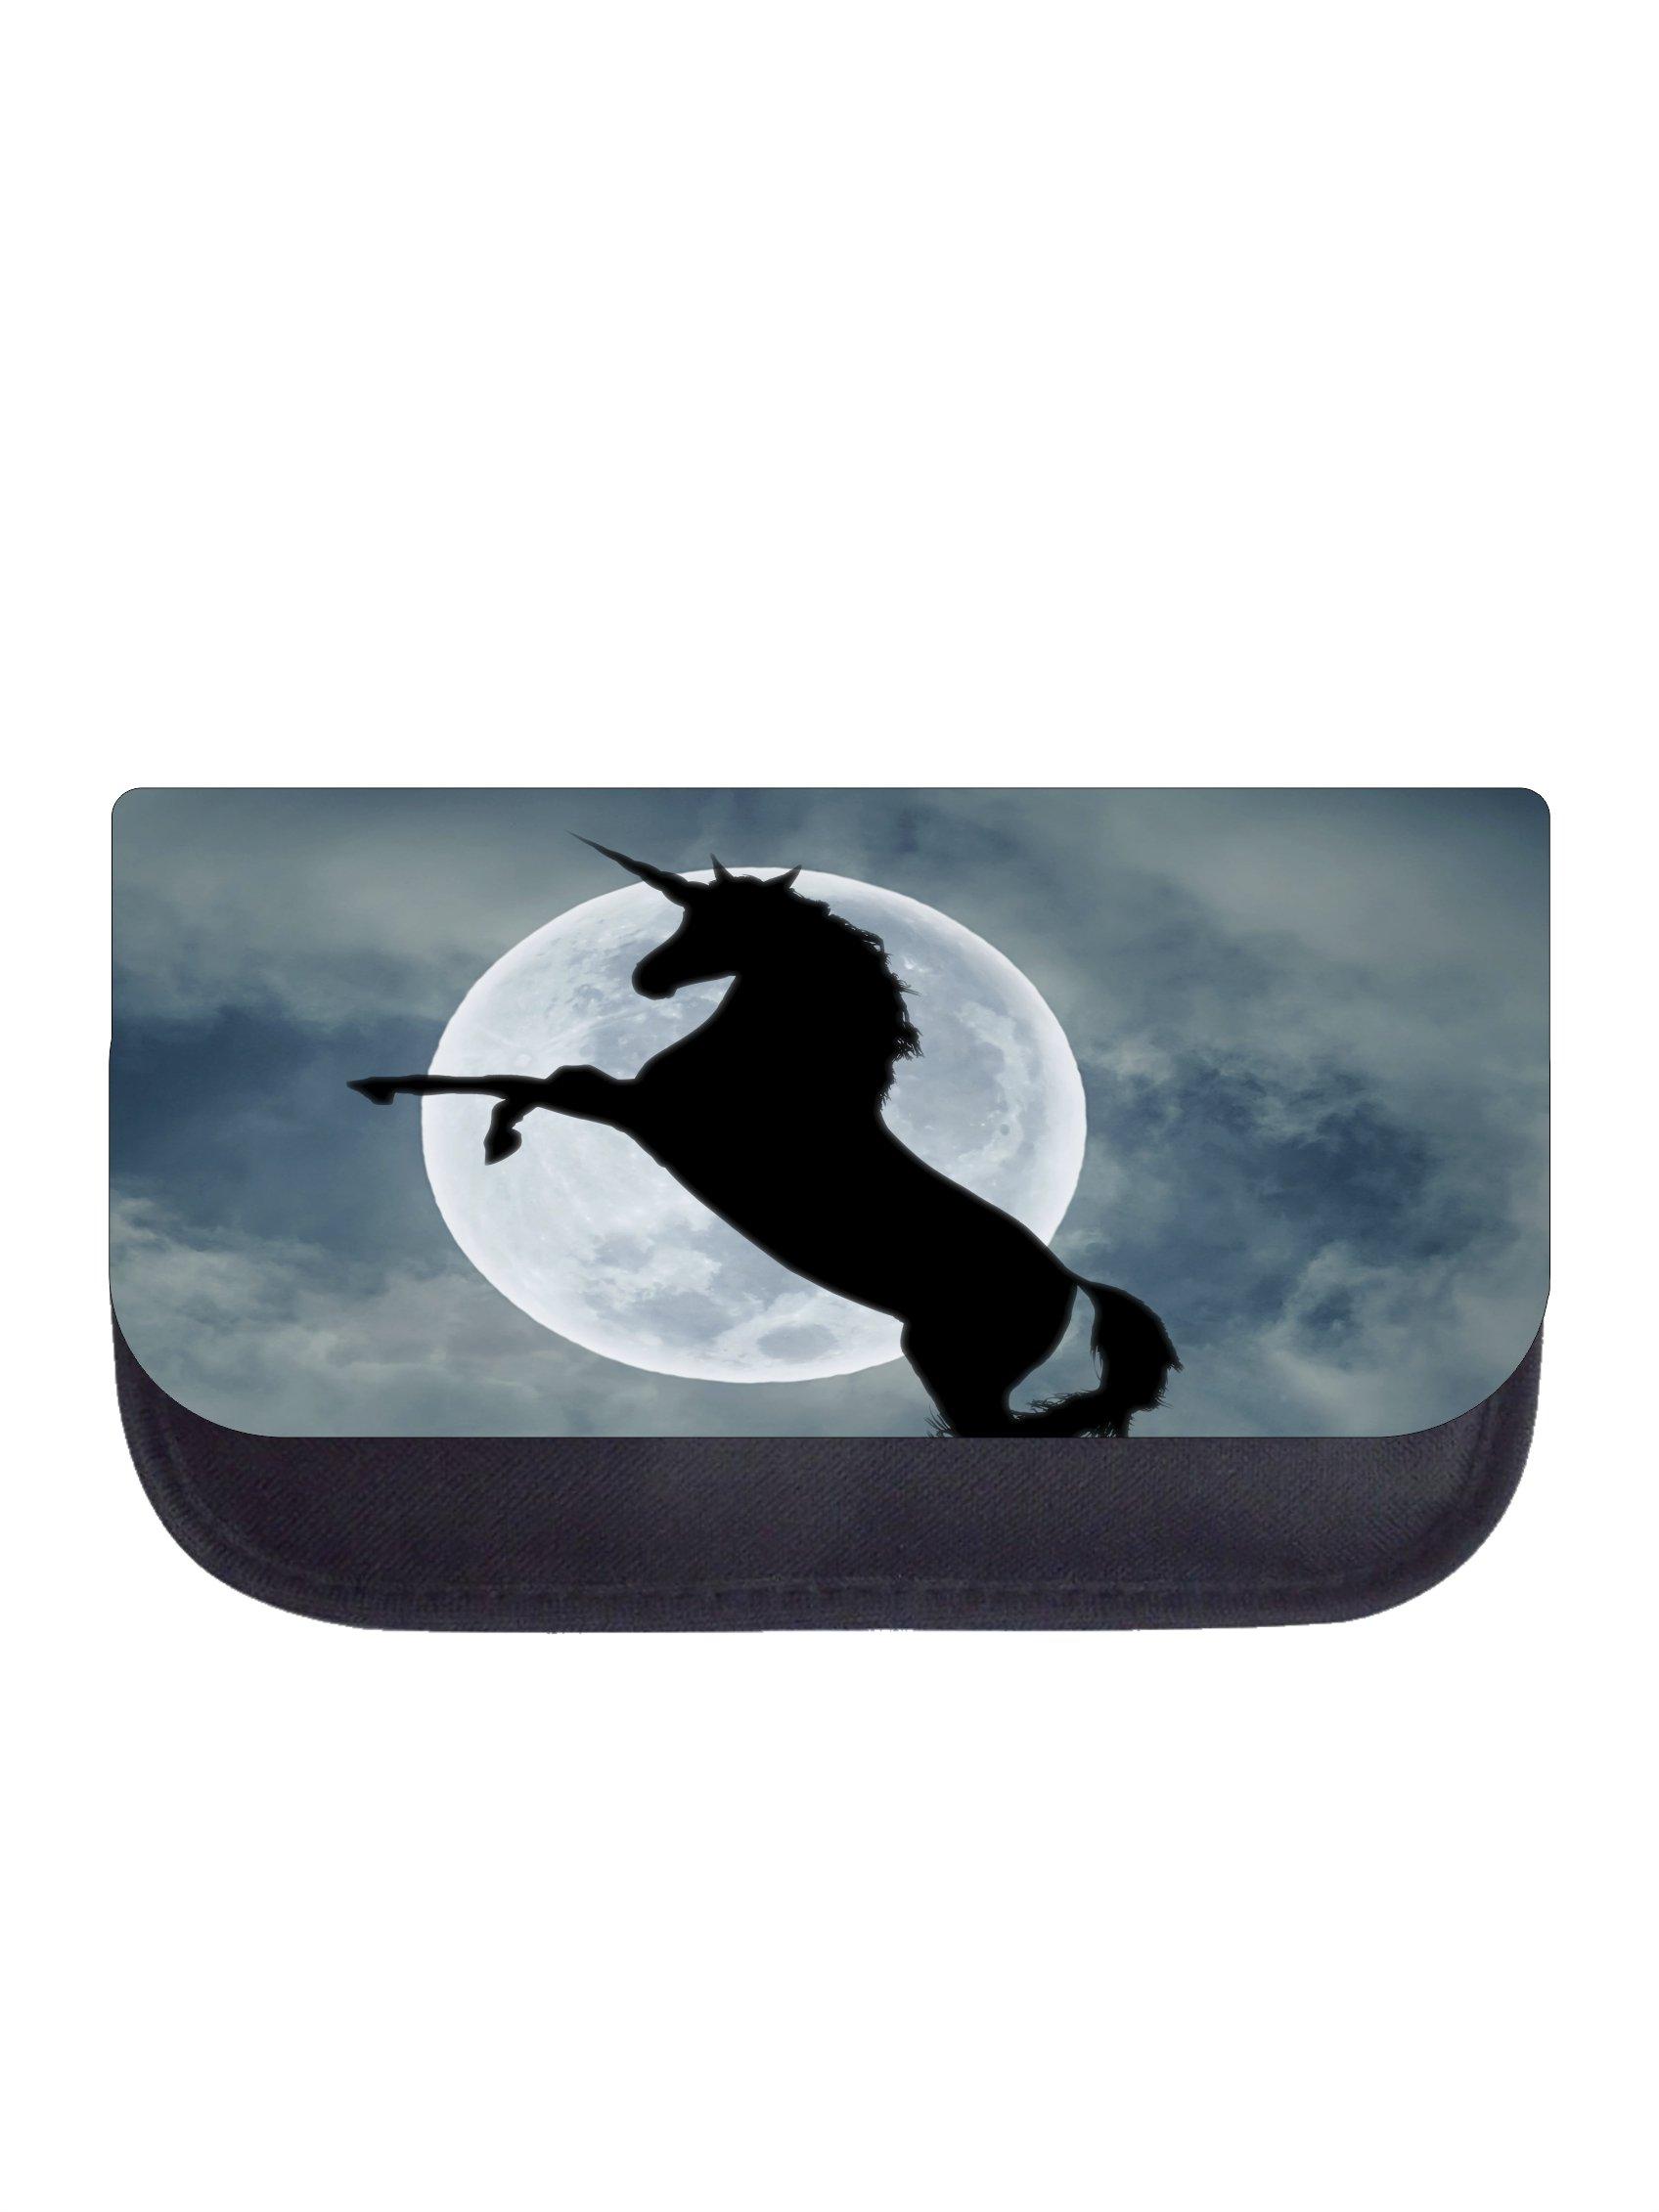 Unicorn in the Moonlight - Girls Black Pencil Case - Pencil Bag